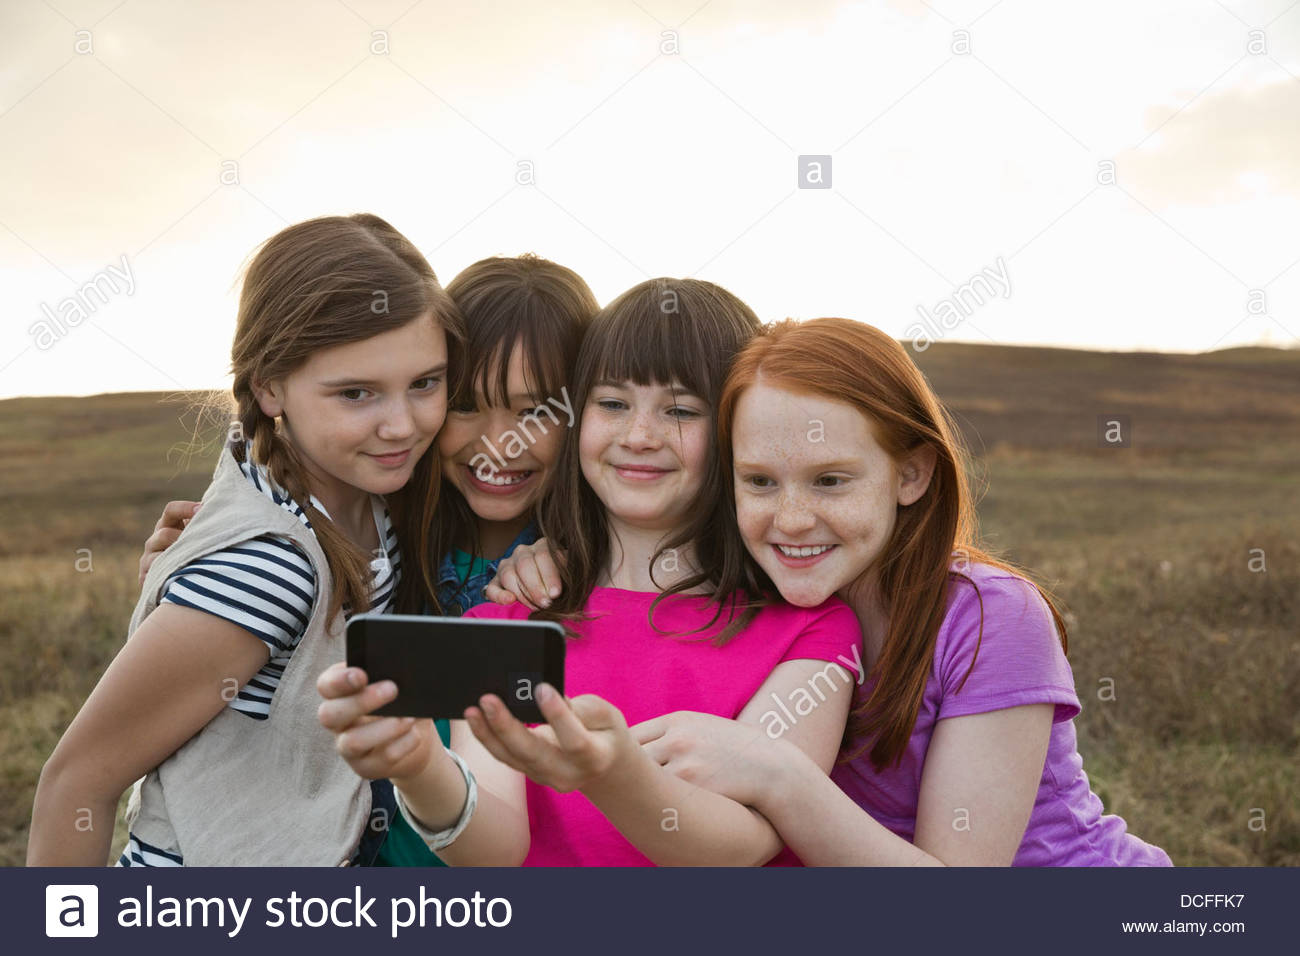 Smiling schoolgirls taking self-portrait outdoors - Stock Image